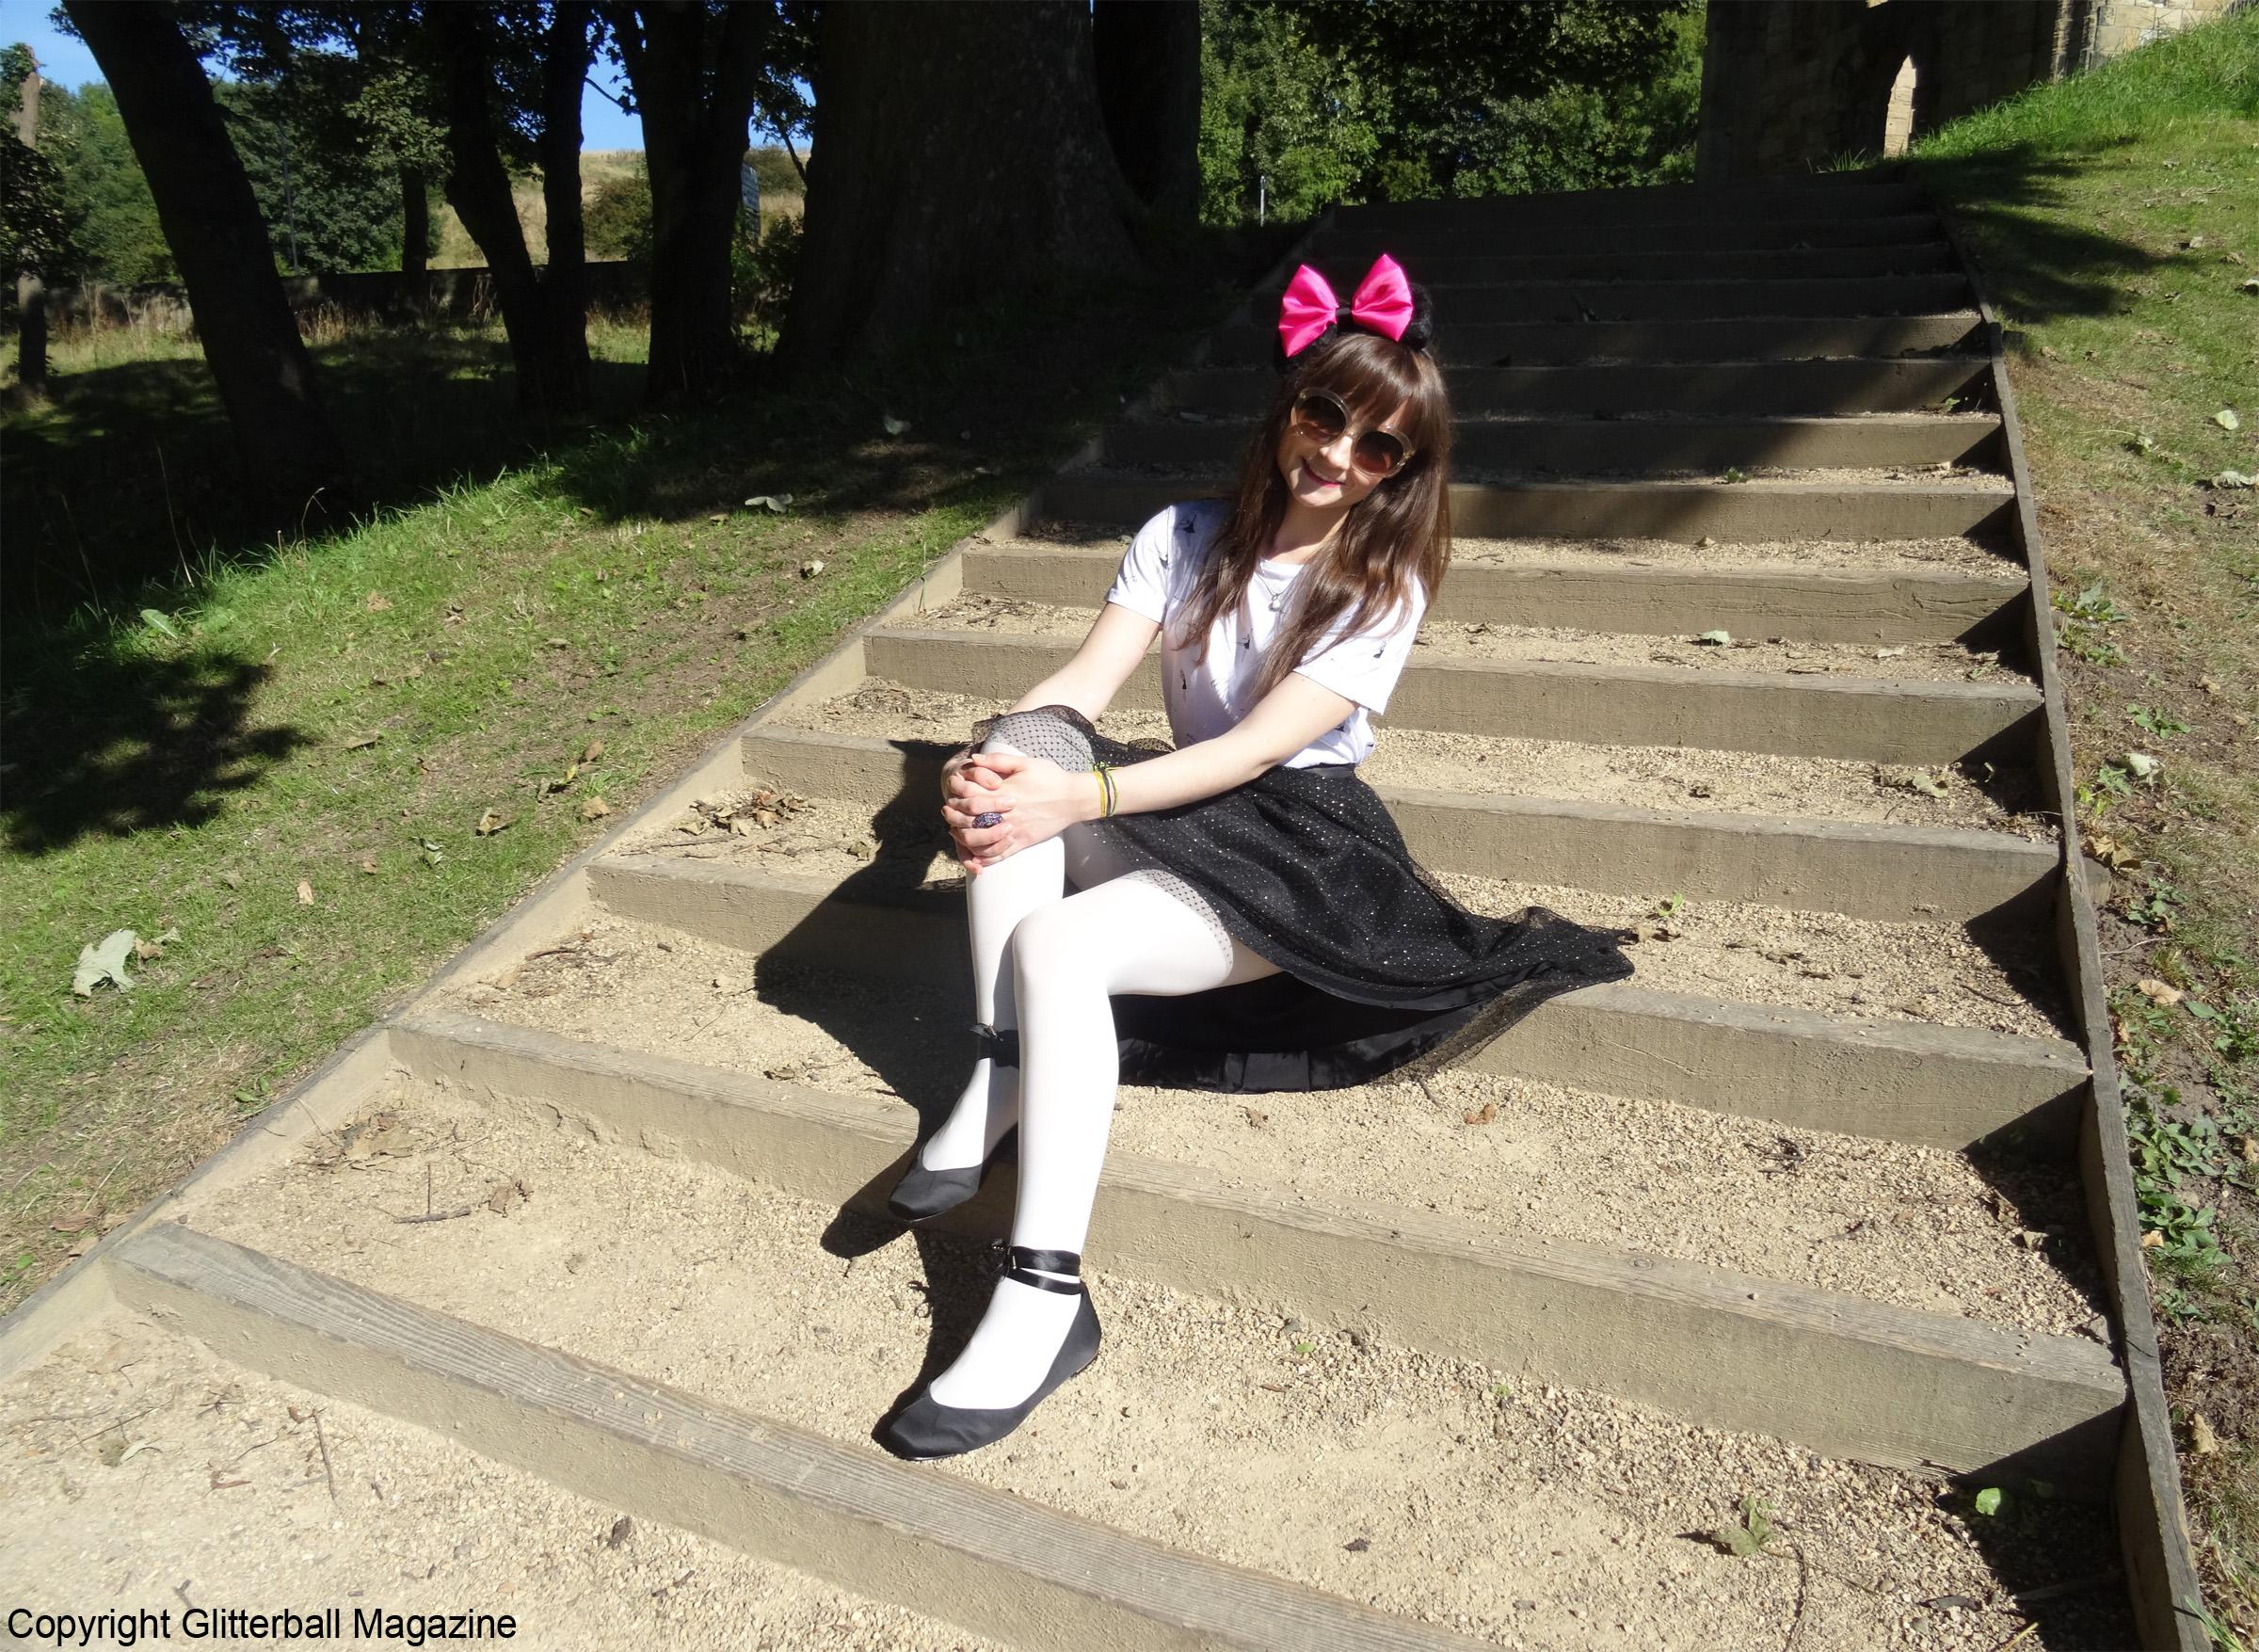 lotw-ballet-chic-25